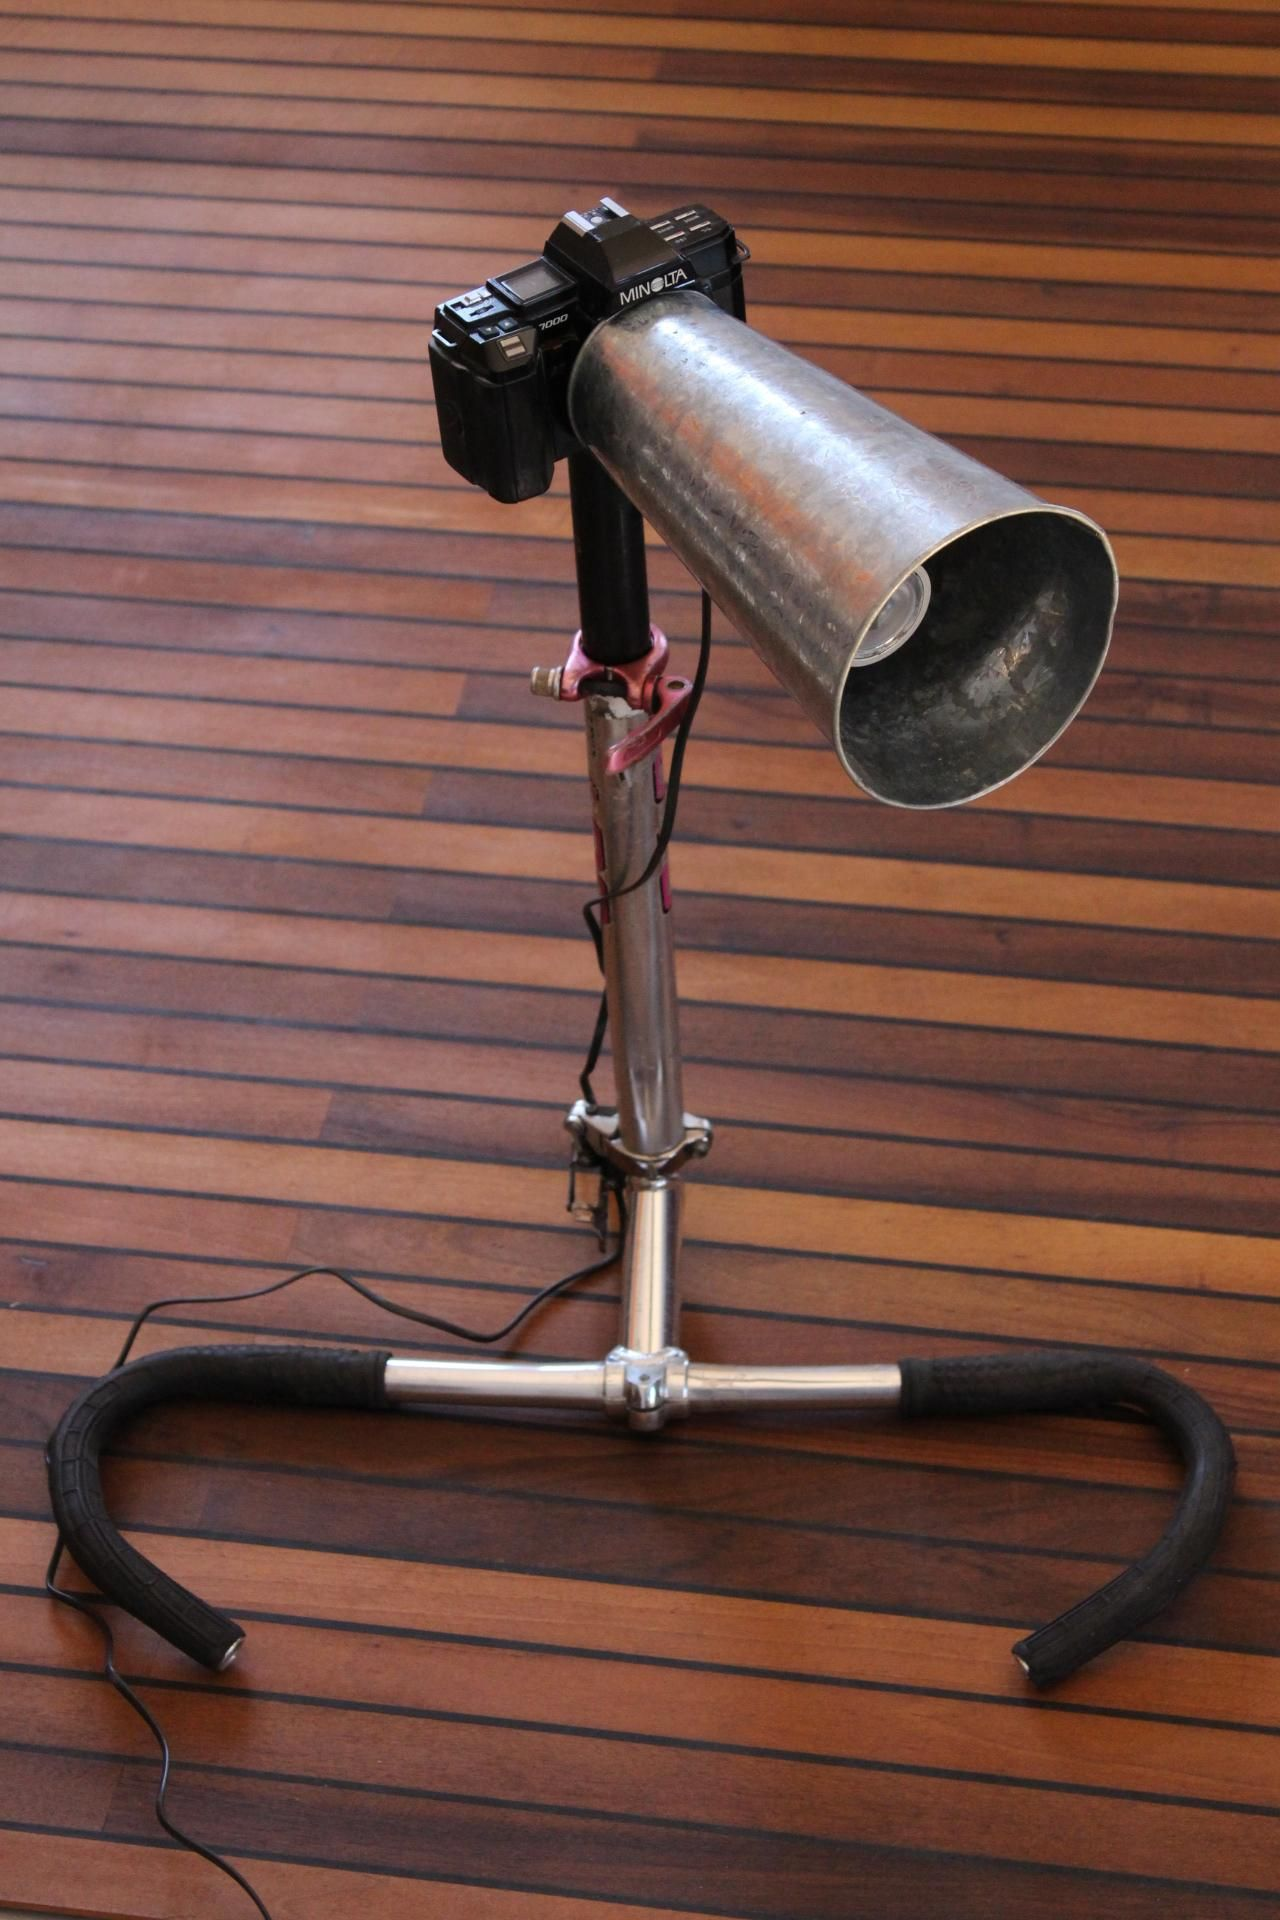 upcycle lampe aus fotokamera und fahrradteilen selber gebaut recycle diy lamp bikeparts. Black Bedroom Furniture Sets. Home Design Ideas